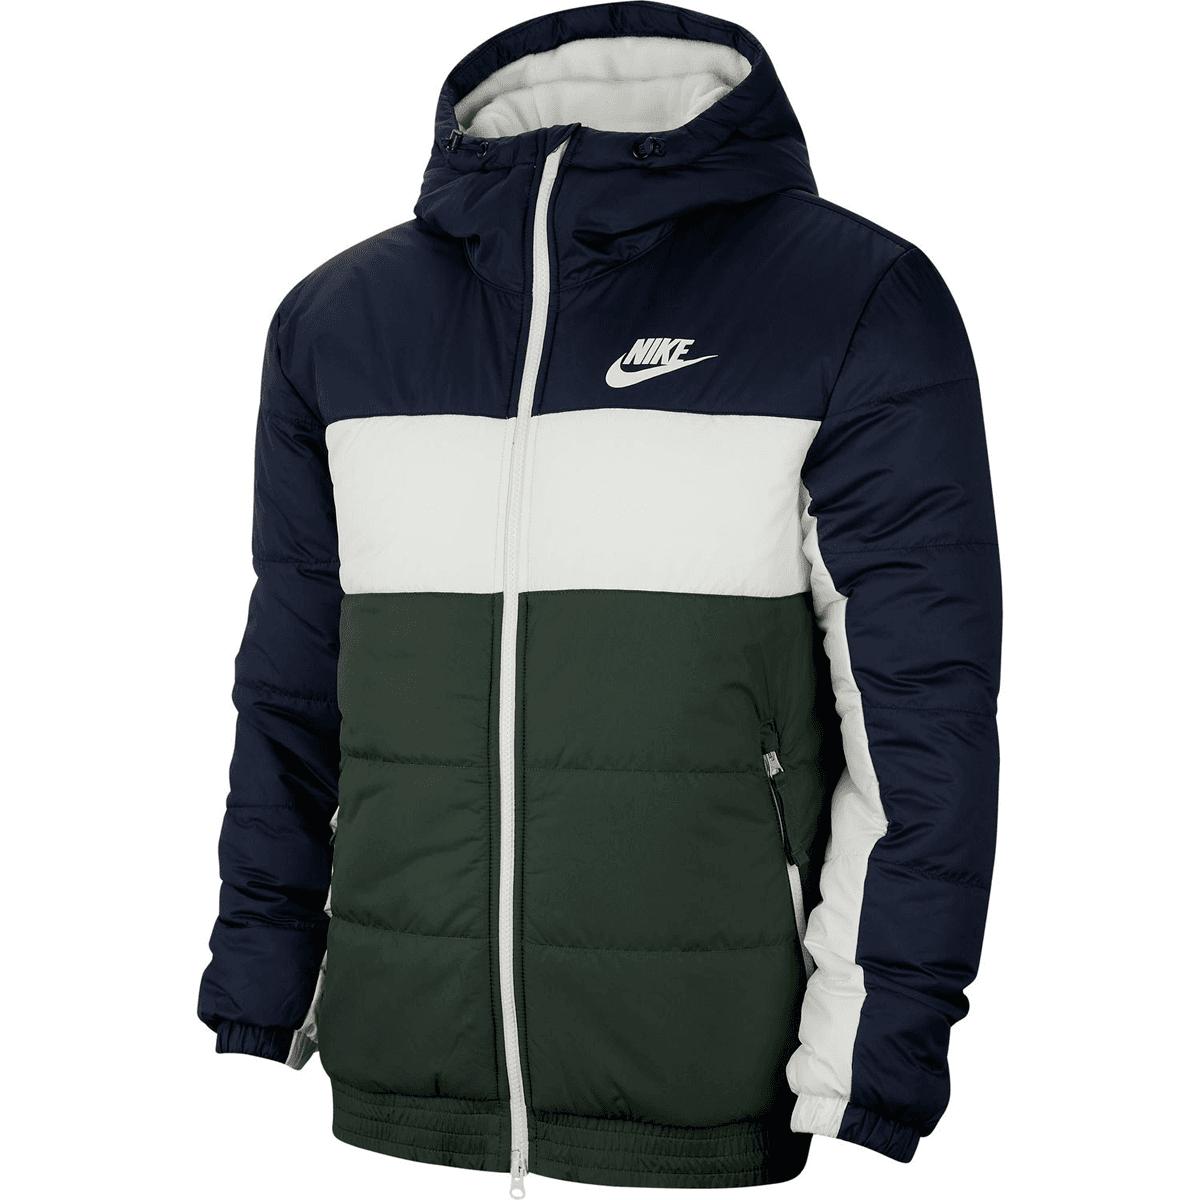 Nike Sportswear Steppjacke dunkelblaugrün